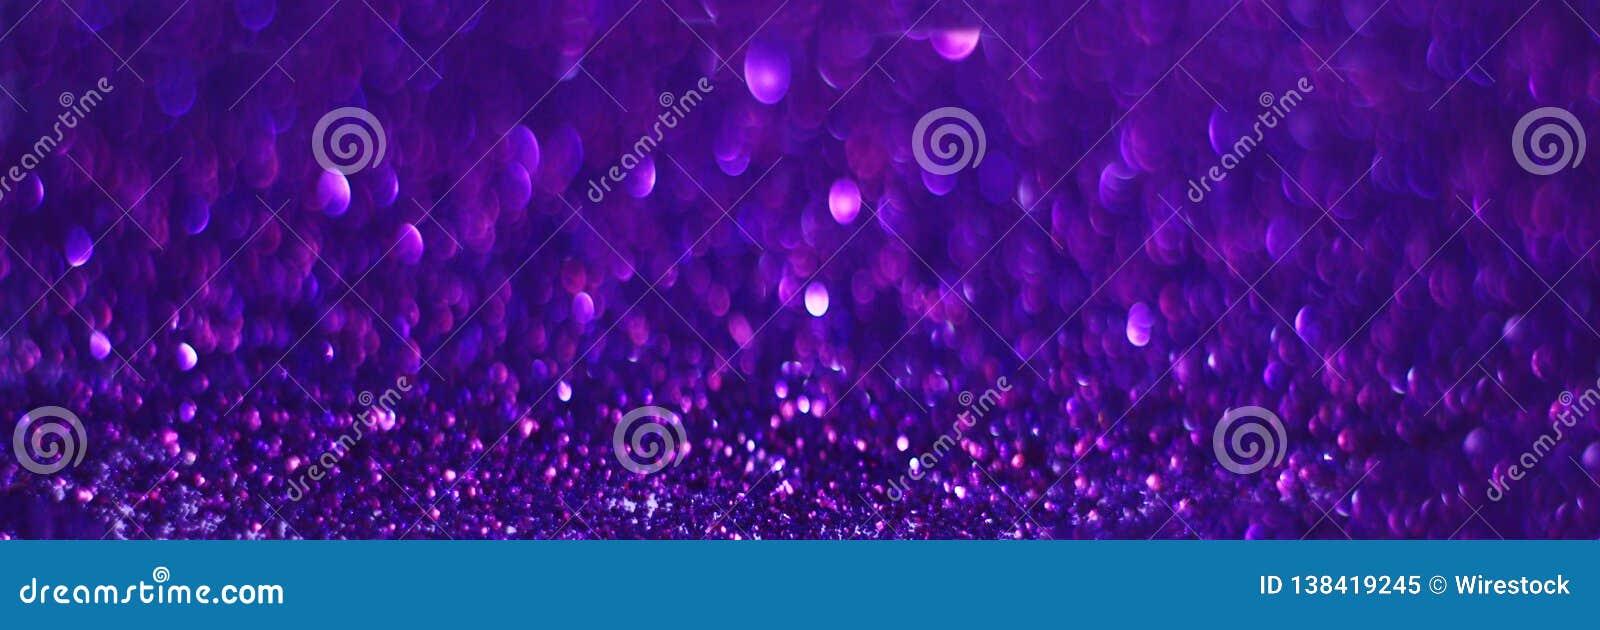 Unduh 5000+ Wallpaper Aesthetic Background HD Paling Keren